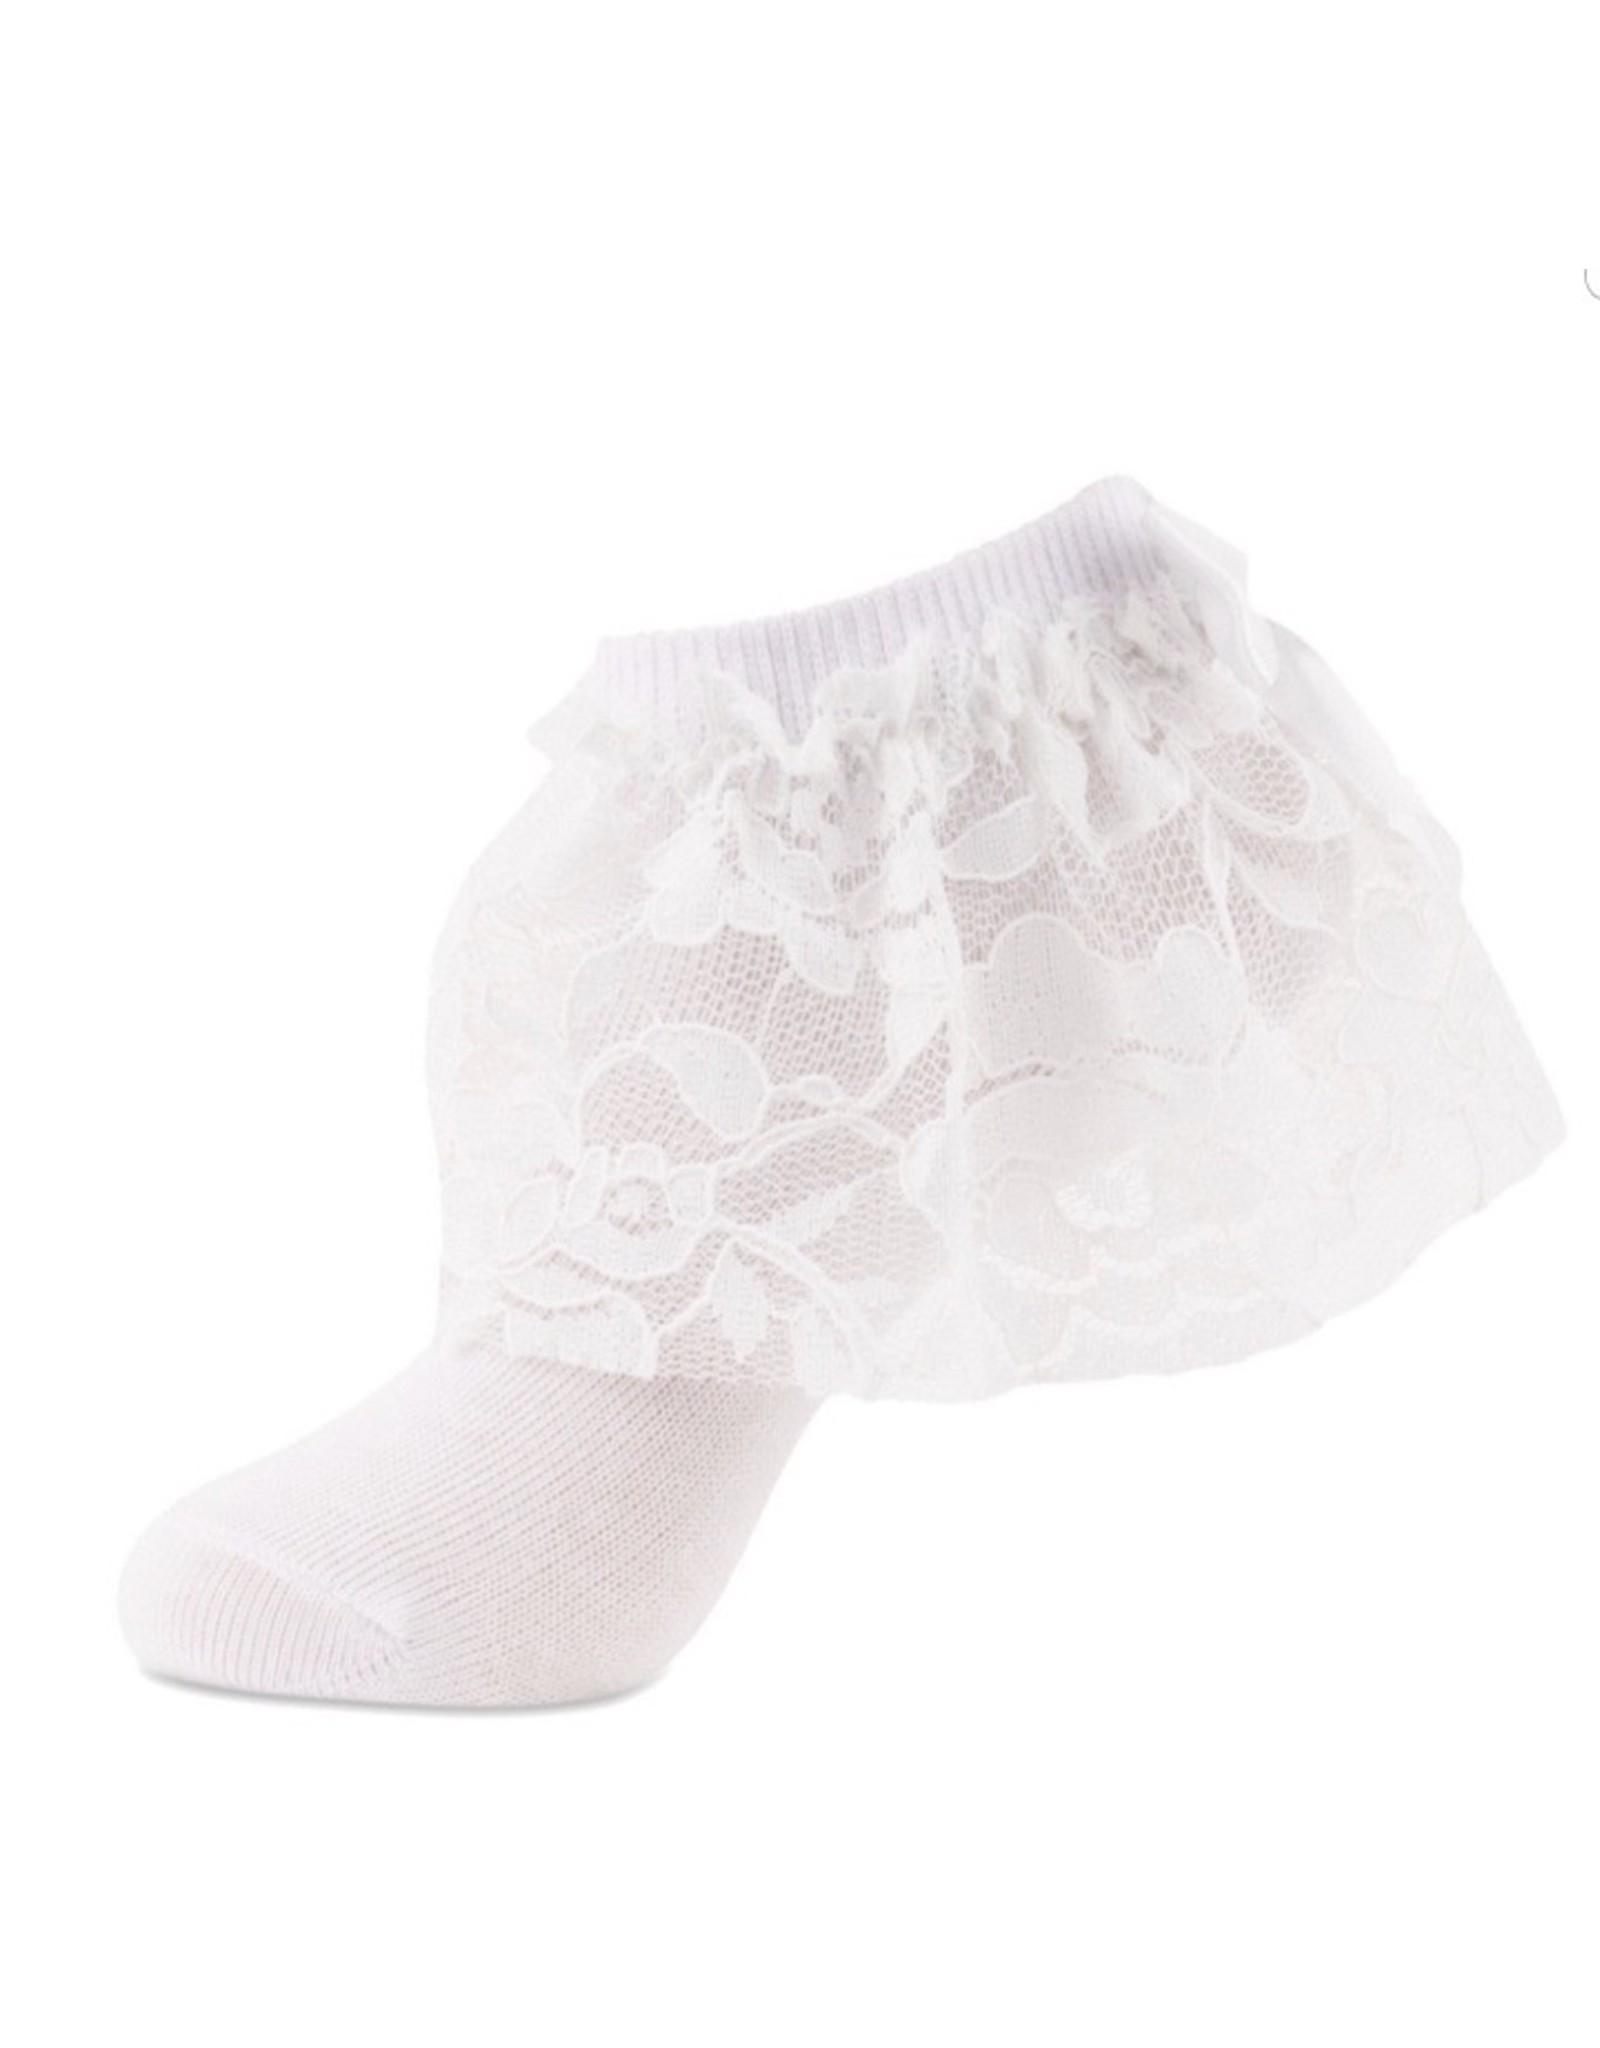 JRP JRP Girls Floral Lace Anklet